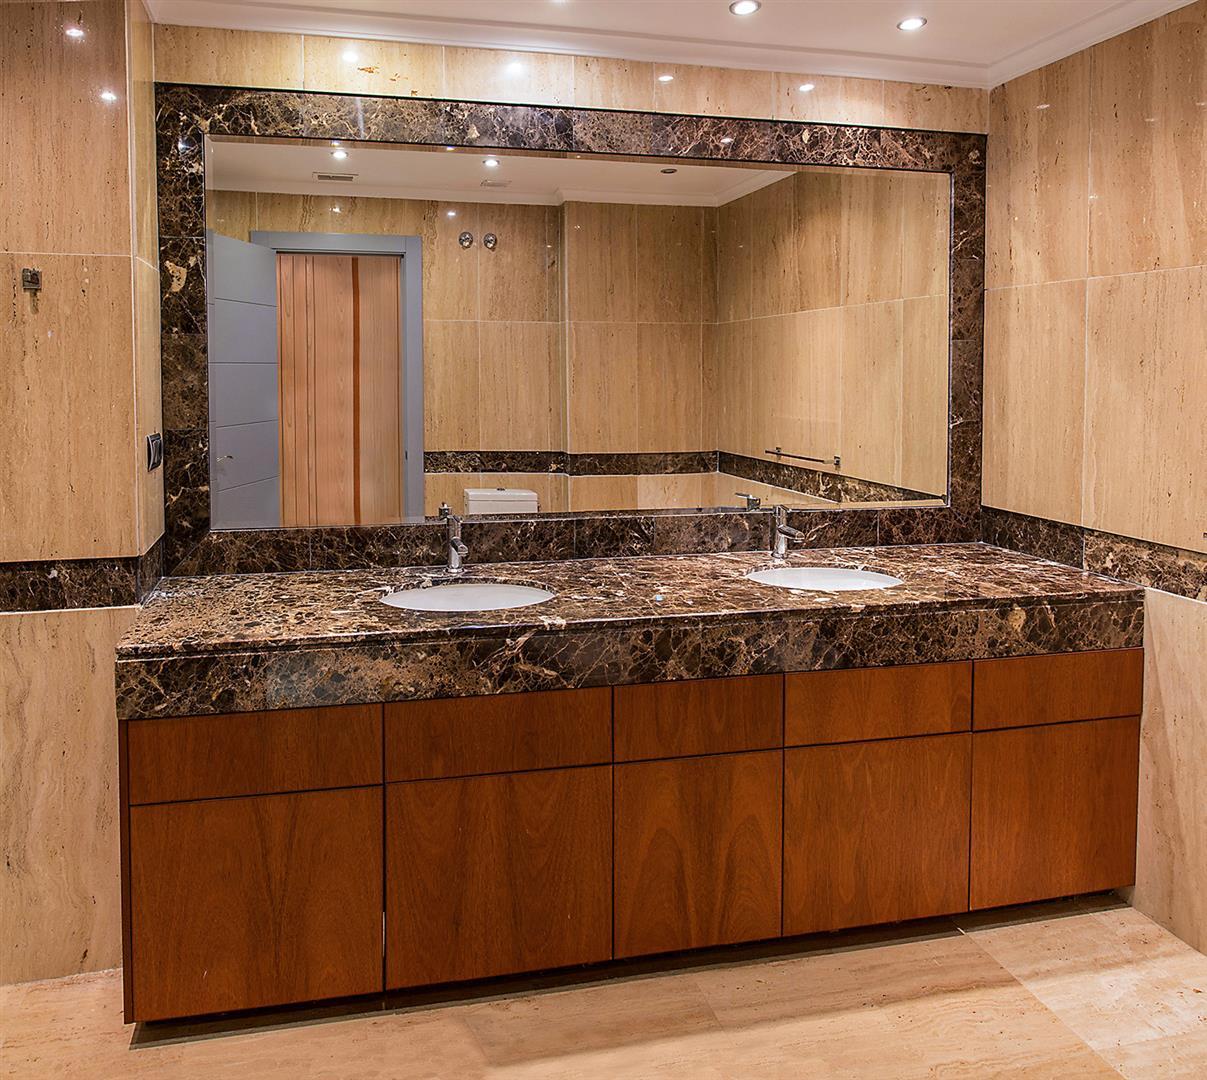 Luxury 2 bedrooms Apartment for sale Puerto Banus Marbella Spain (4) (Large)